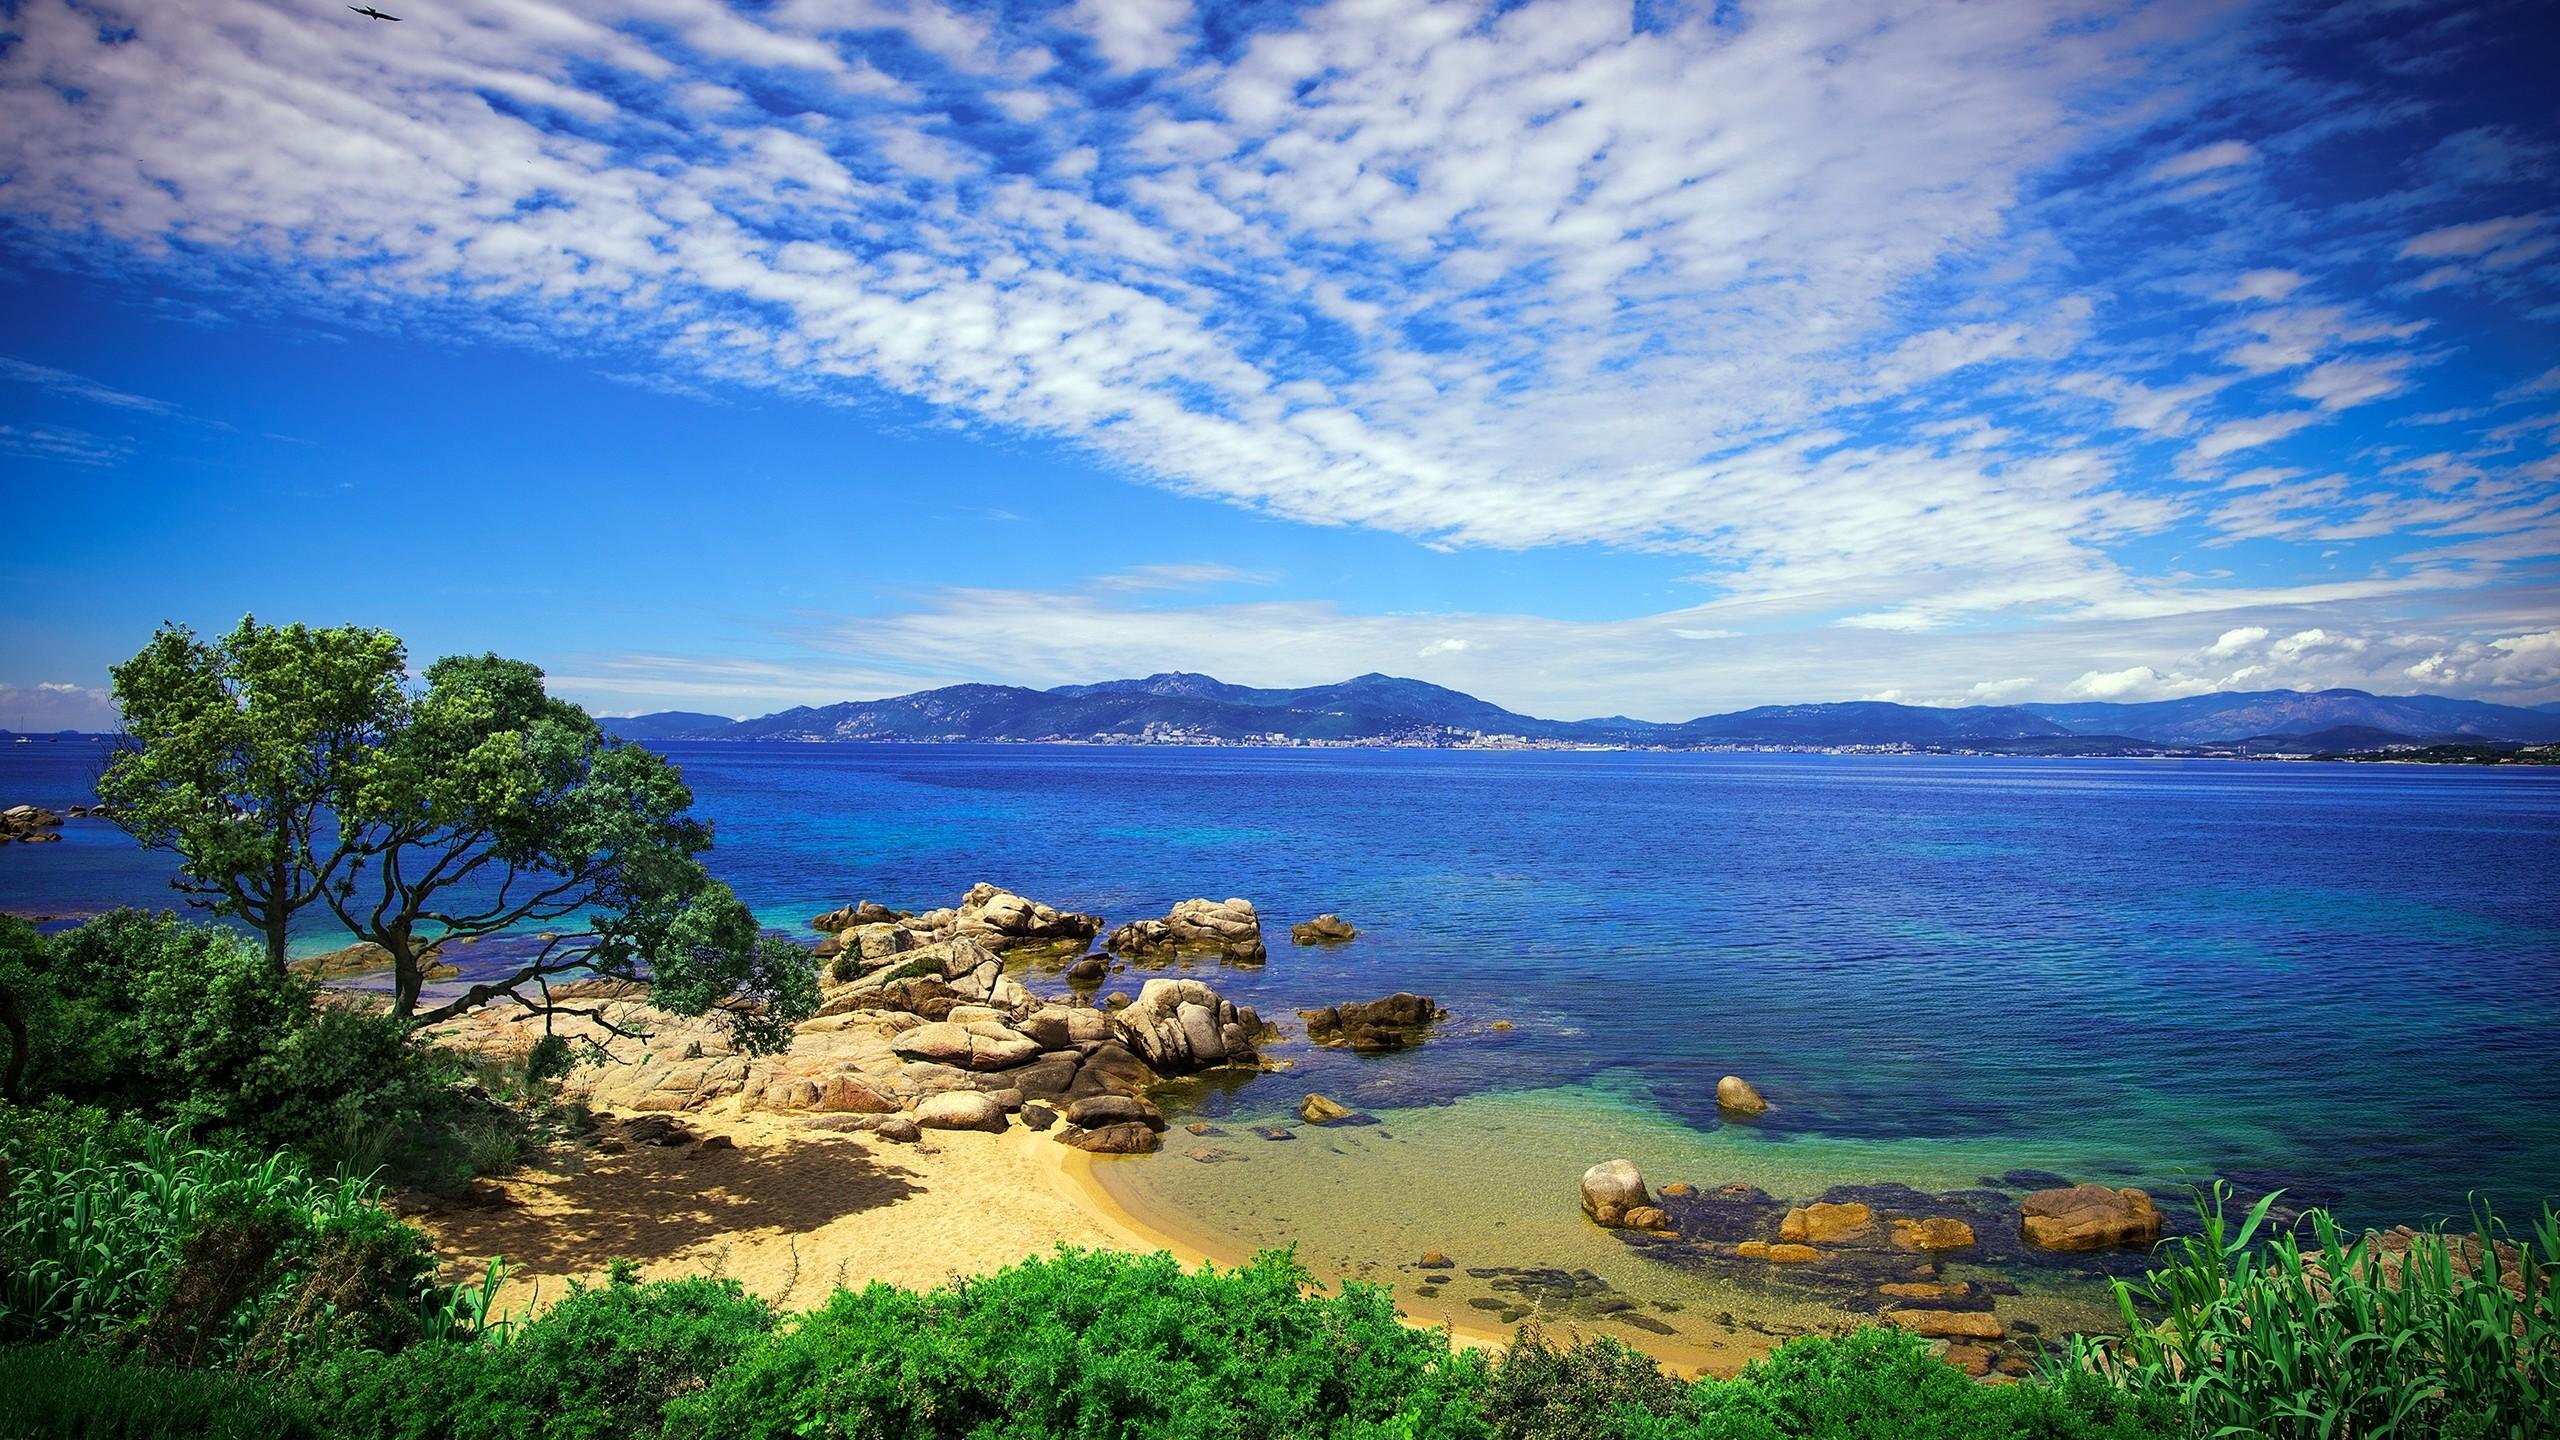 Wallpaper beach, sky, grass, sea, beautiful scenery